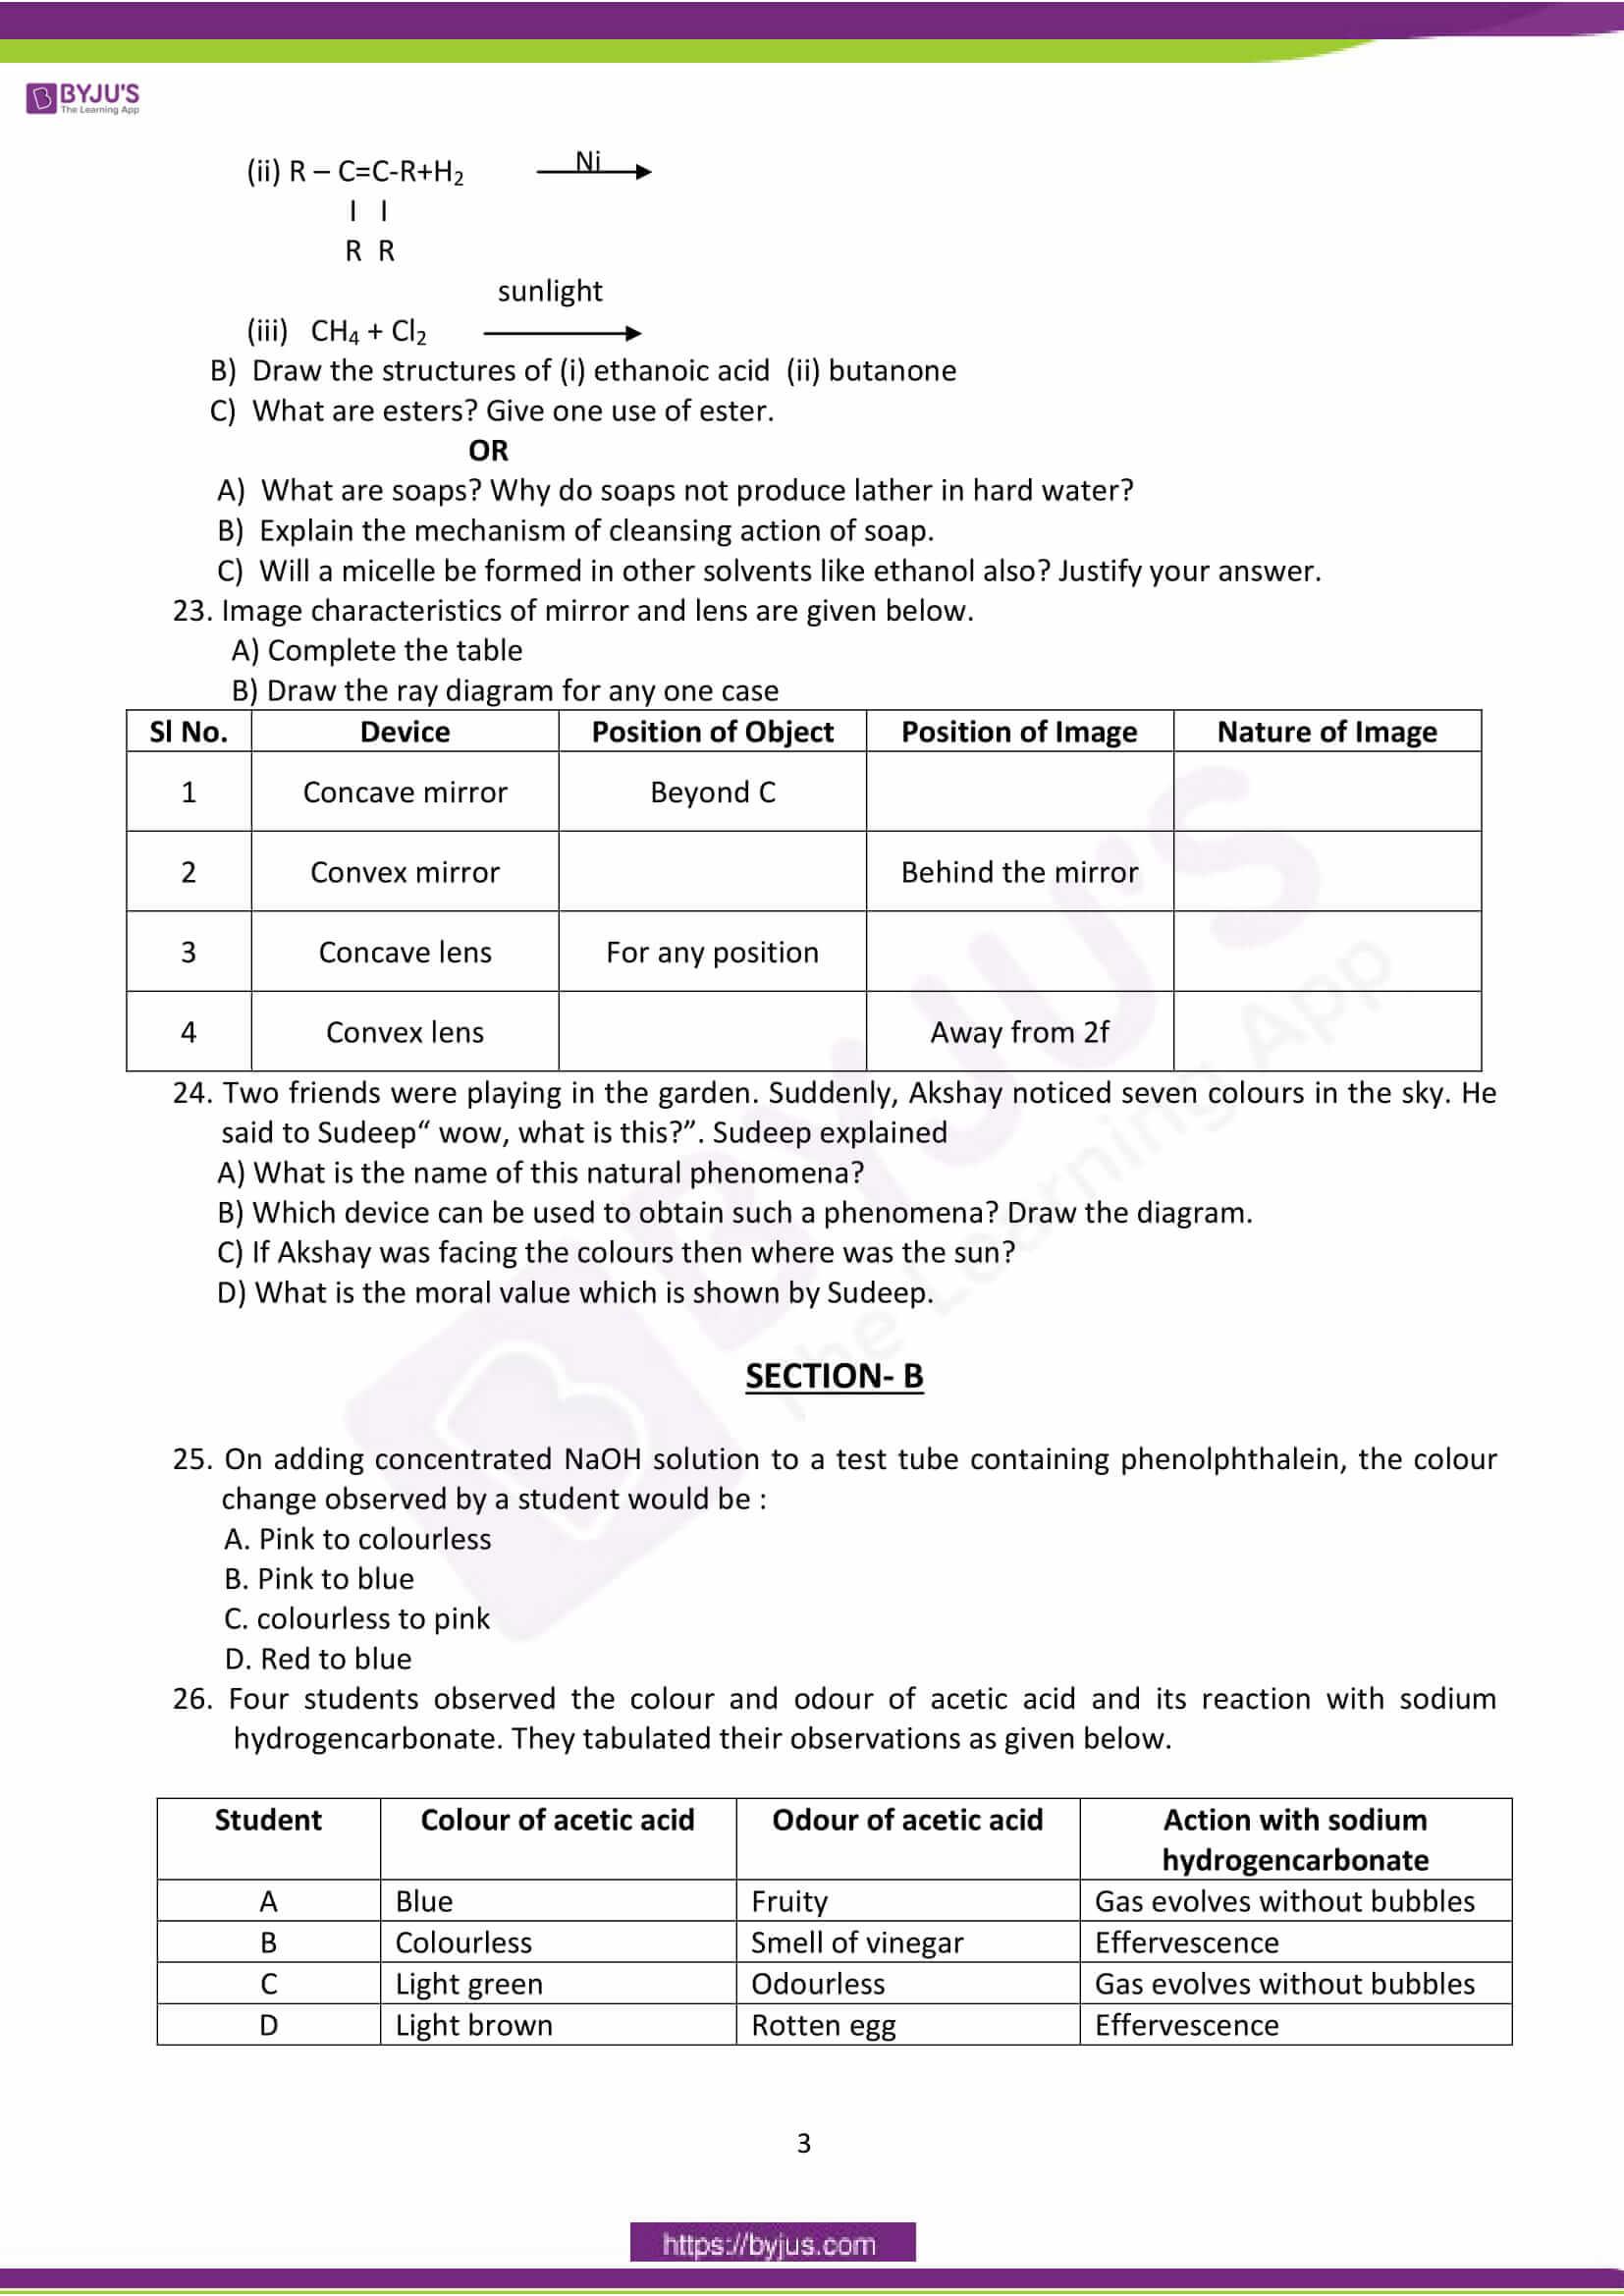 cbse class 10 science sample paper sa 2 set 2